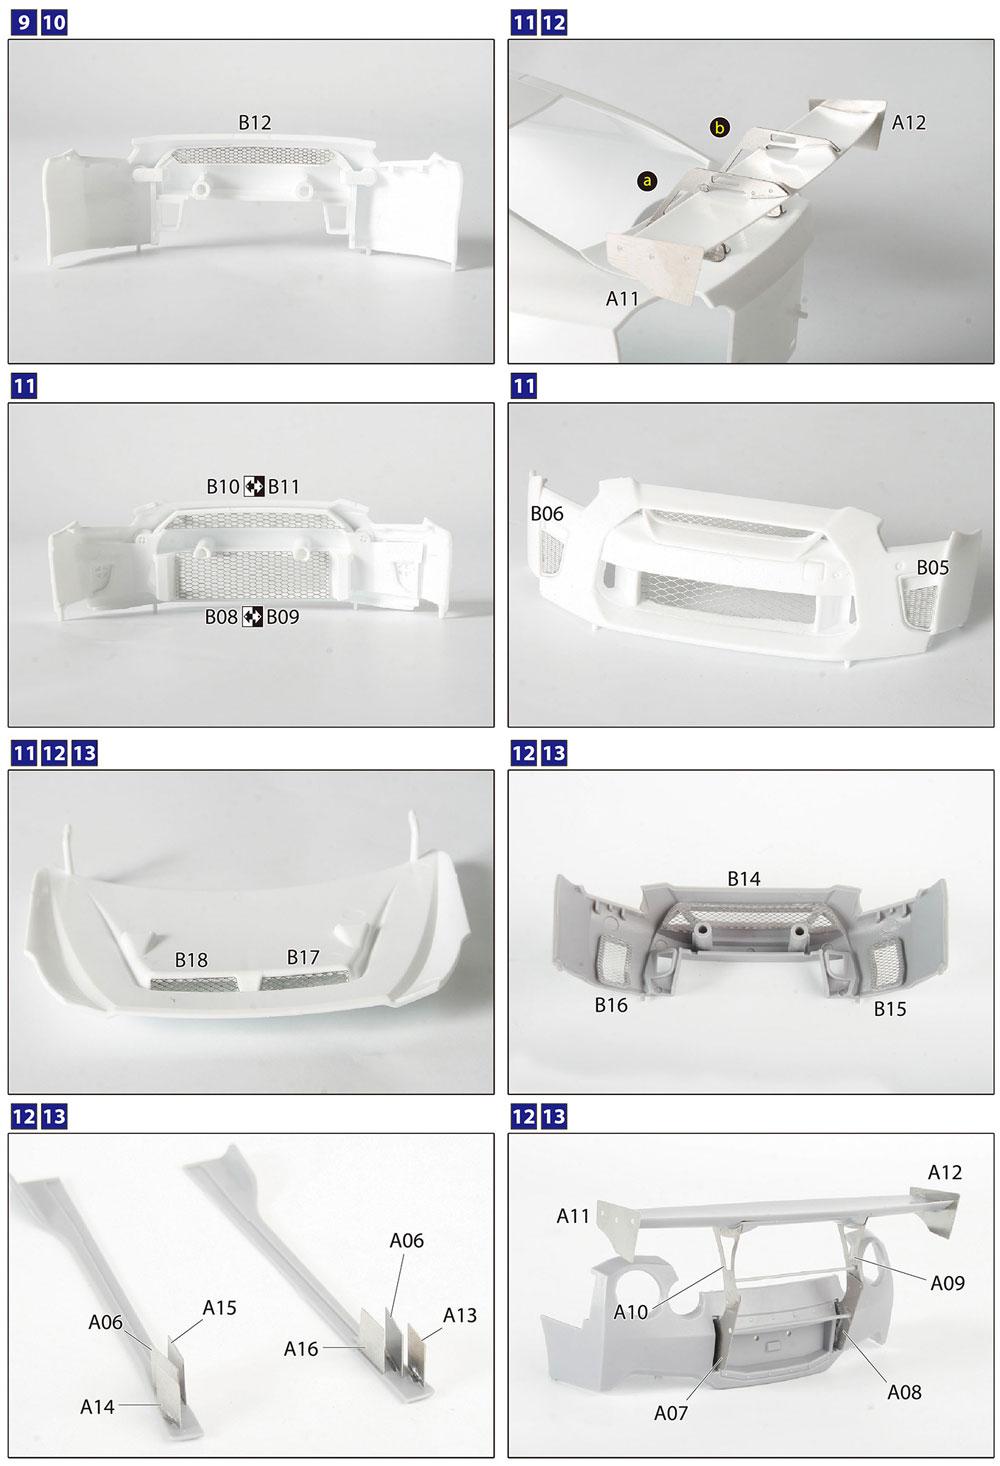 LBワークス R35 GT-R 共通ディテールアップパーツエッチング(アオシマ1/24 リバティウォーク ディテールアップパーツNo.056783)商品画像_3